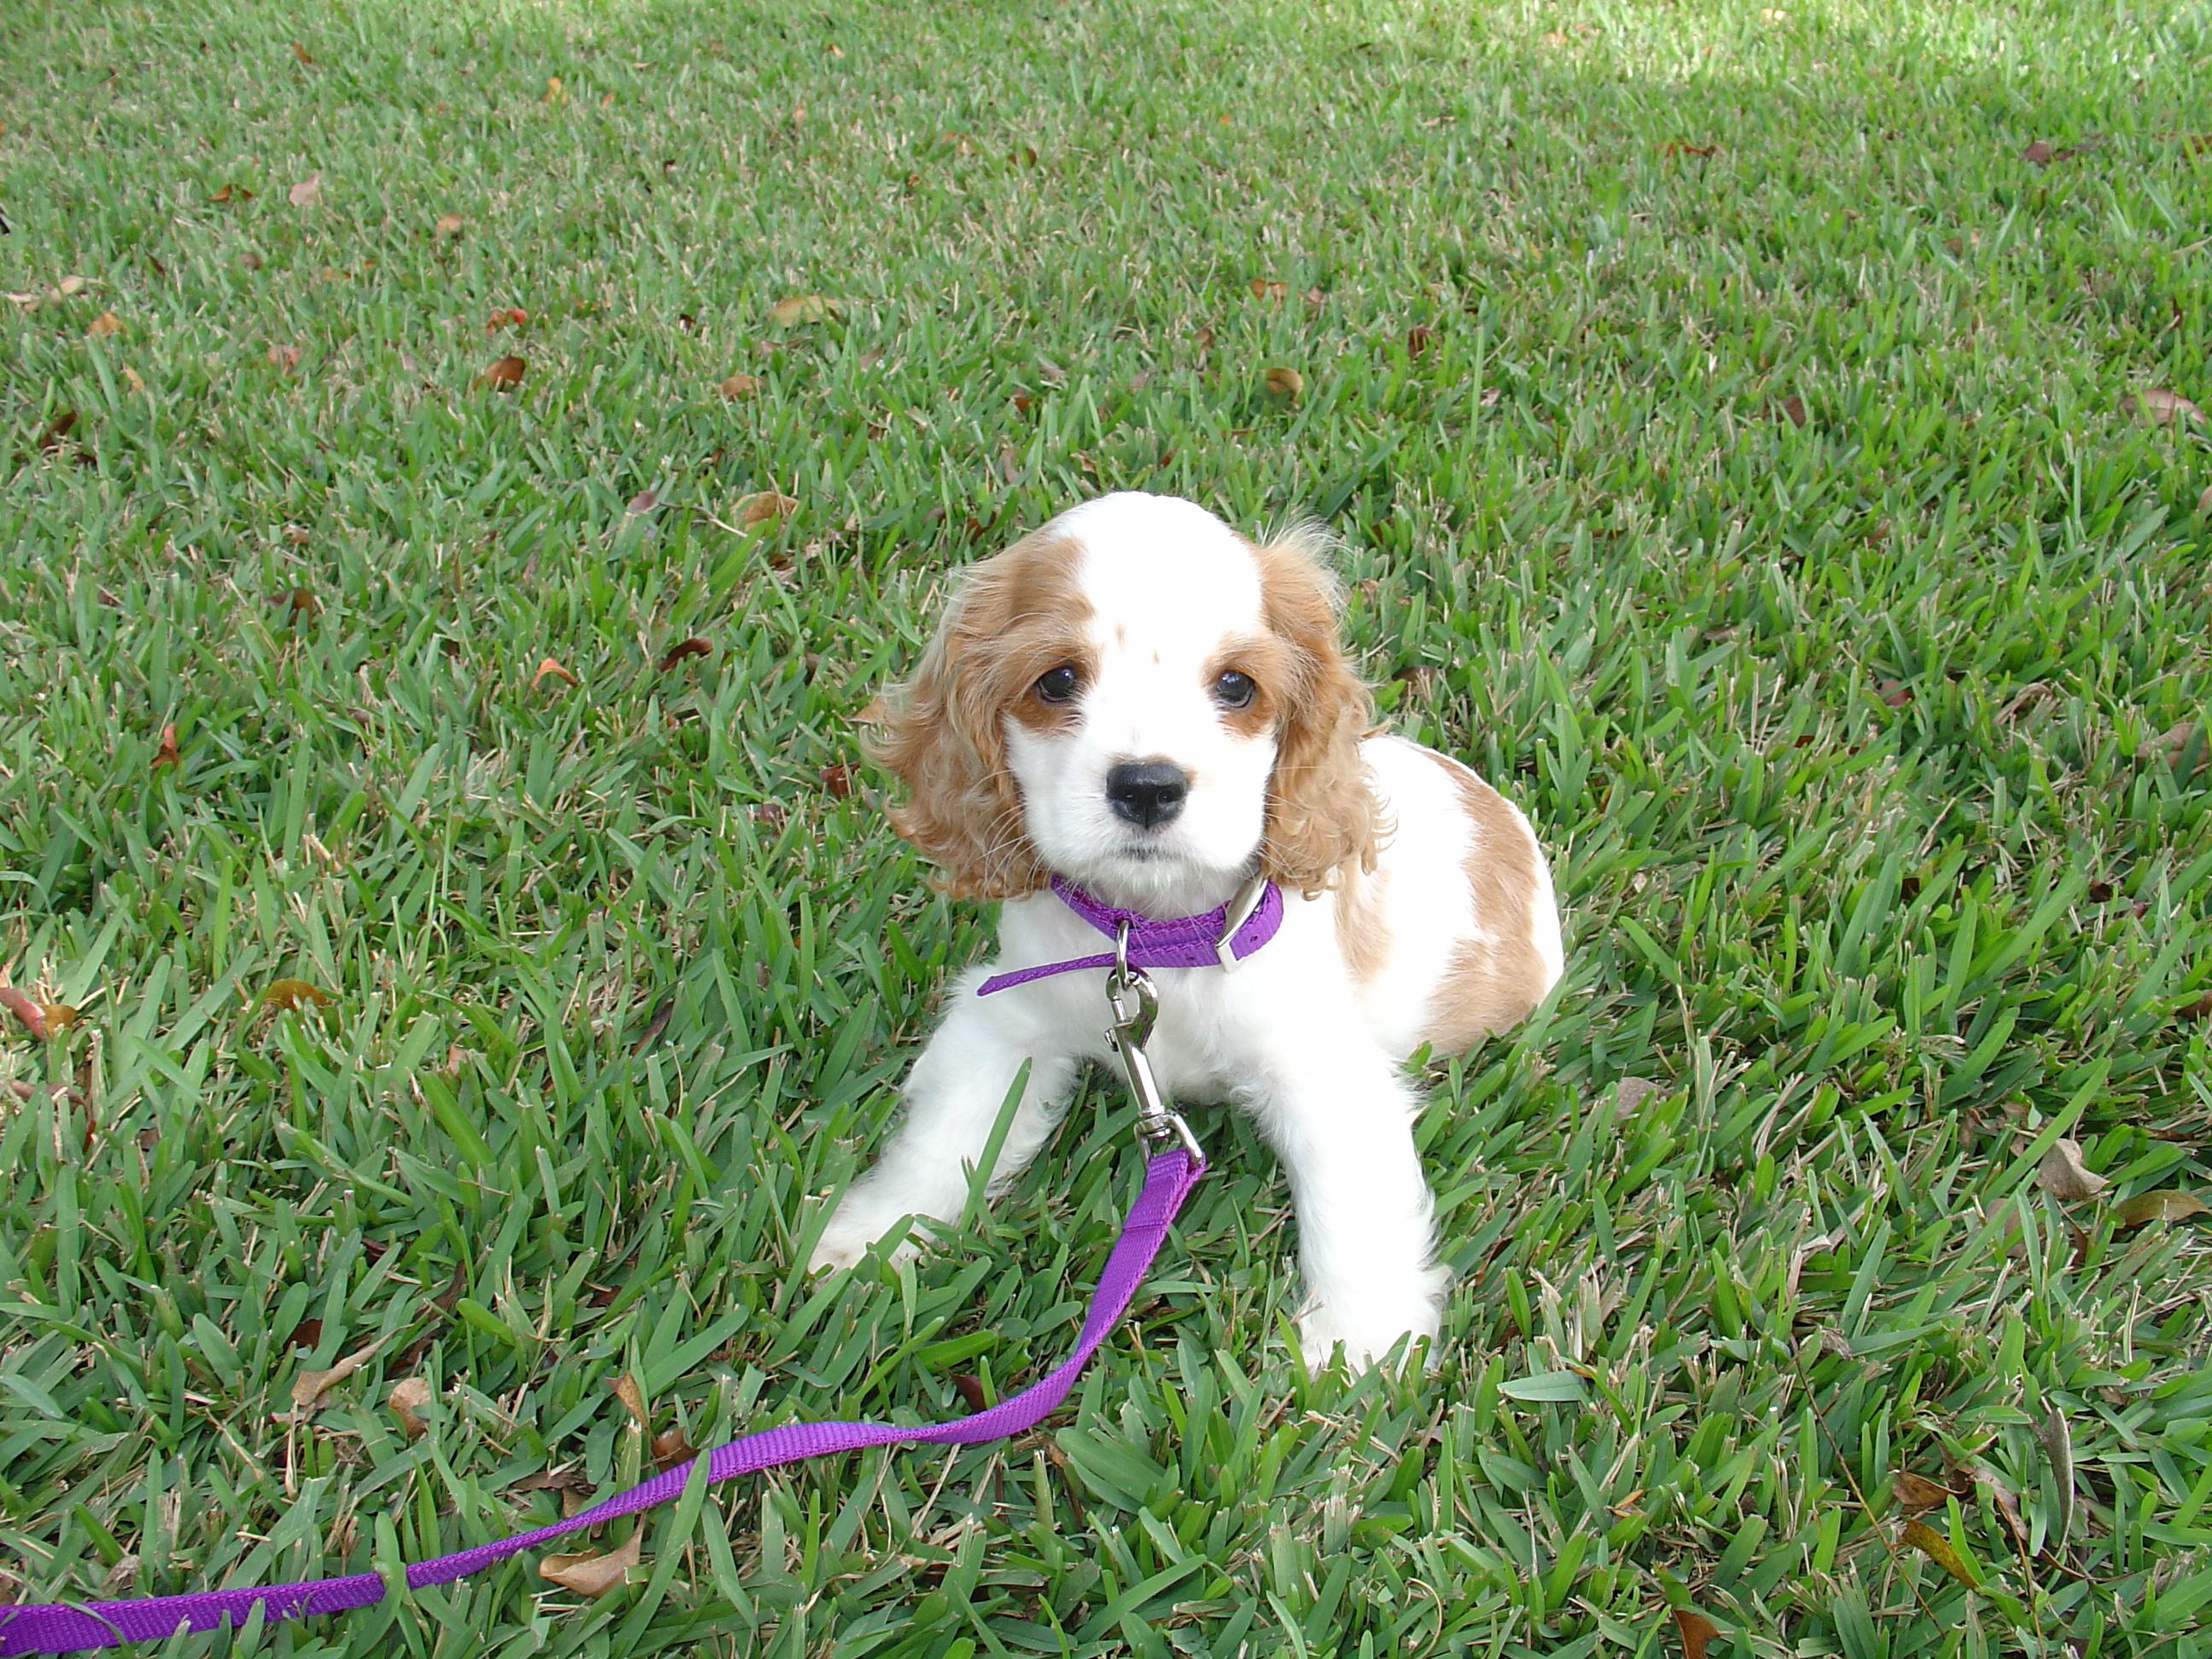 When Did Puppy Dog Collars Emerge